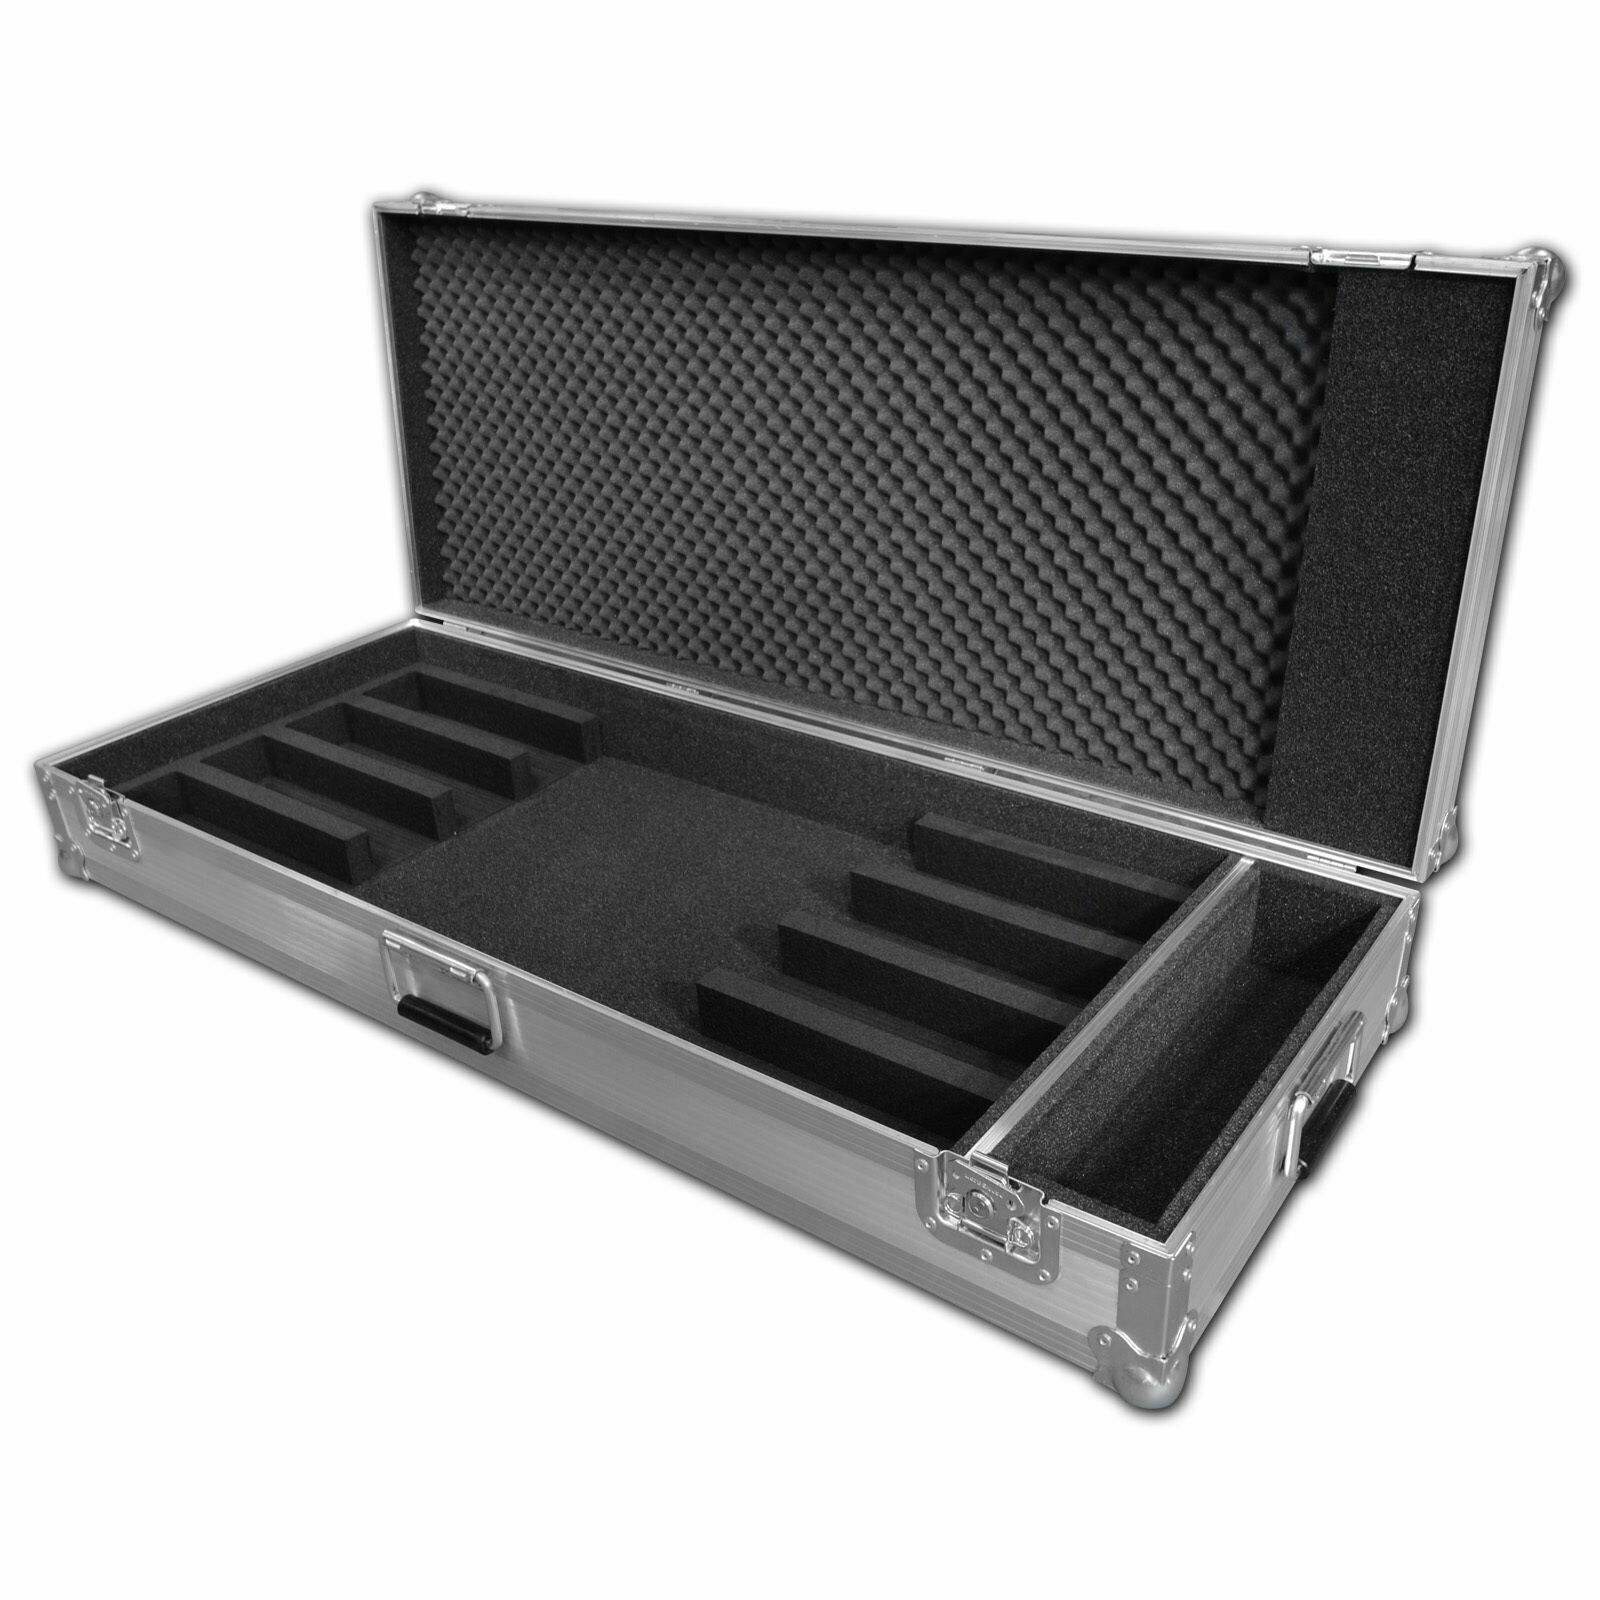 LED Batten Flight Case To fit 4 Battens for Showtec RGB Bar